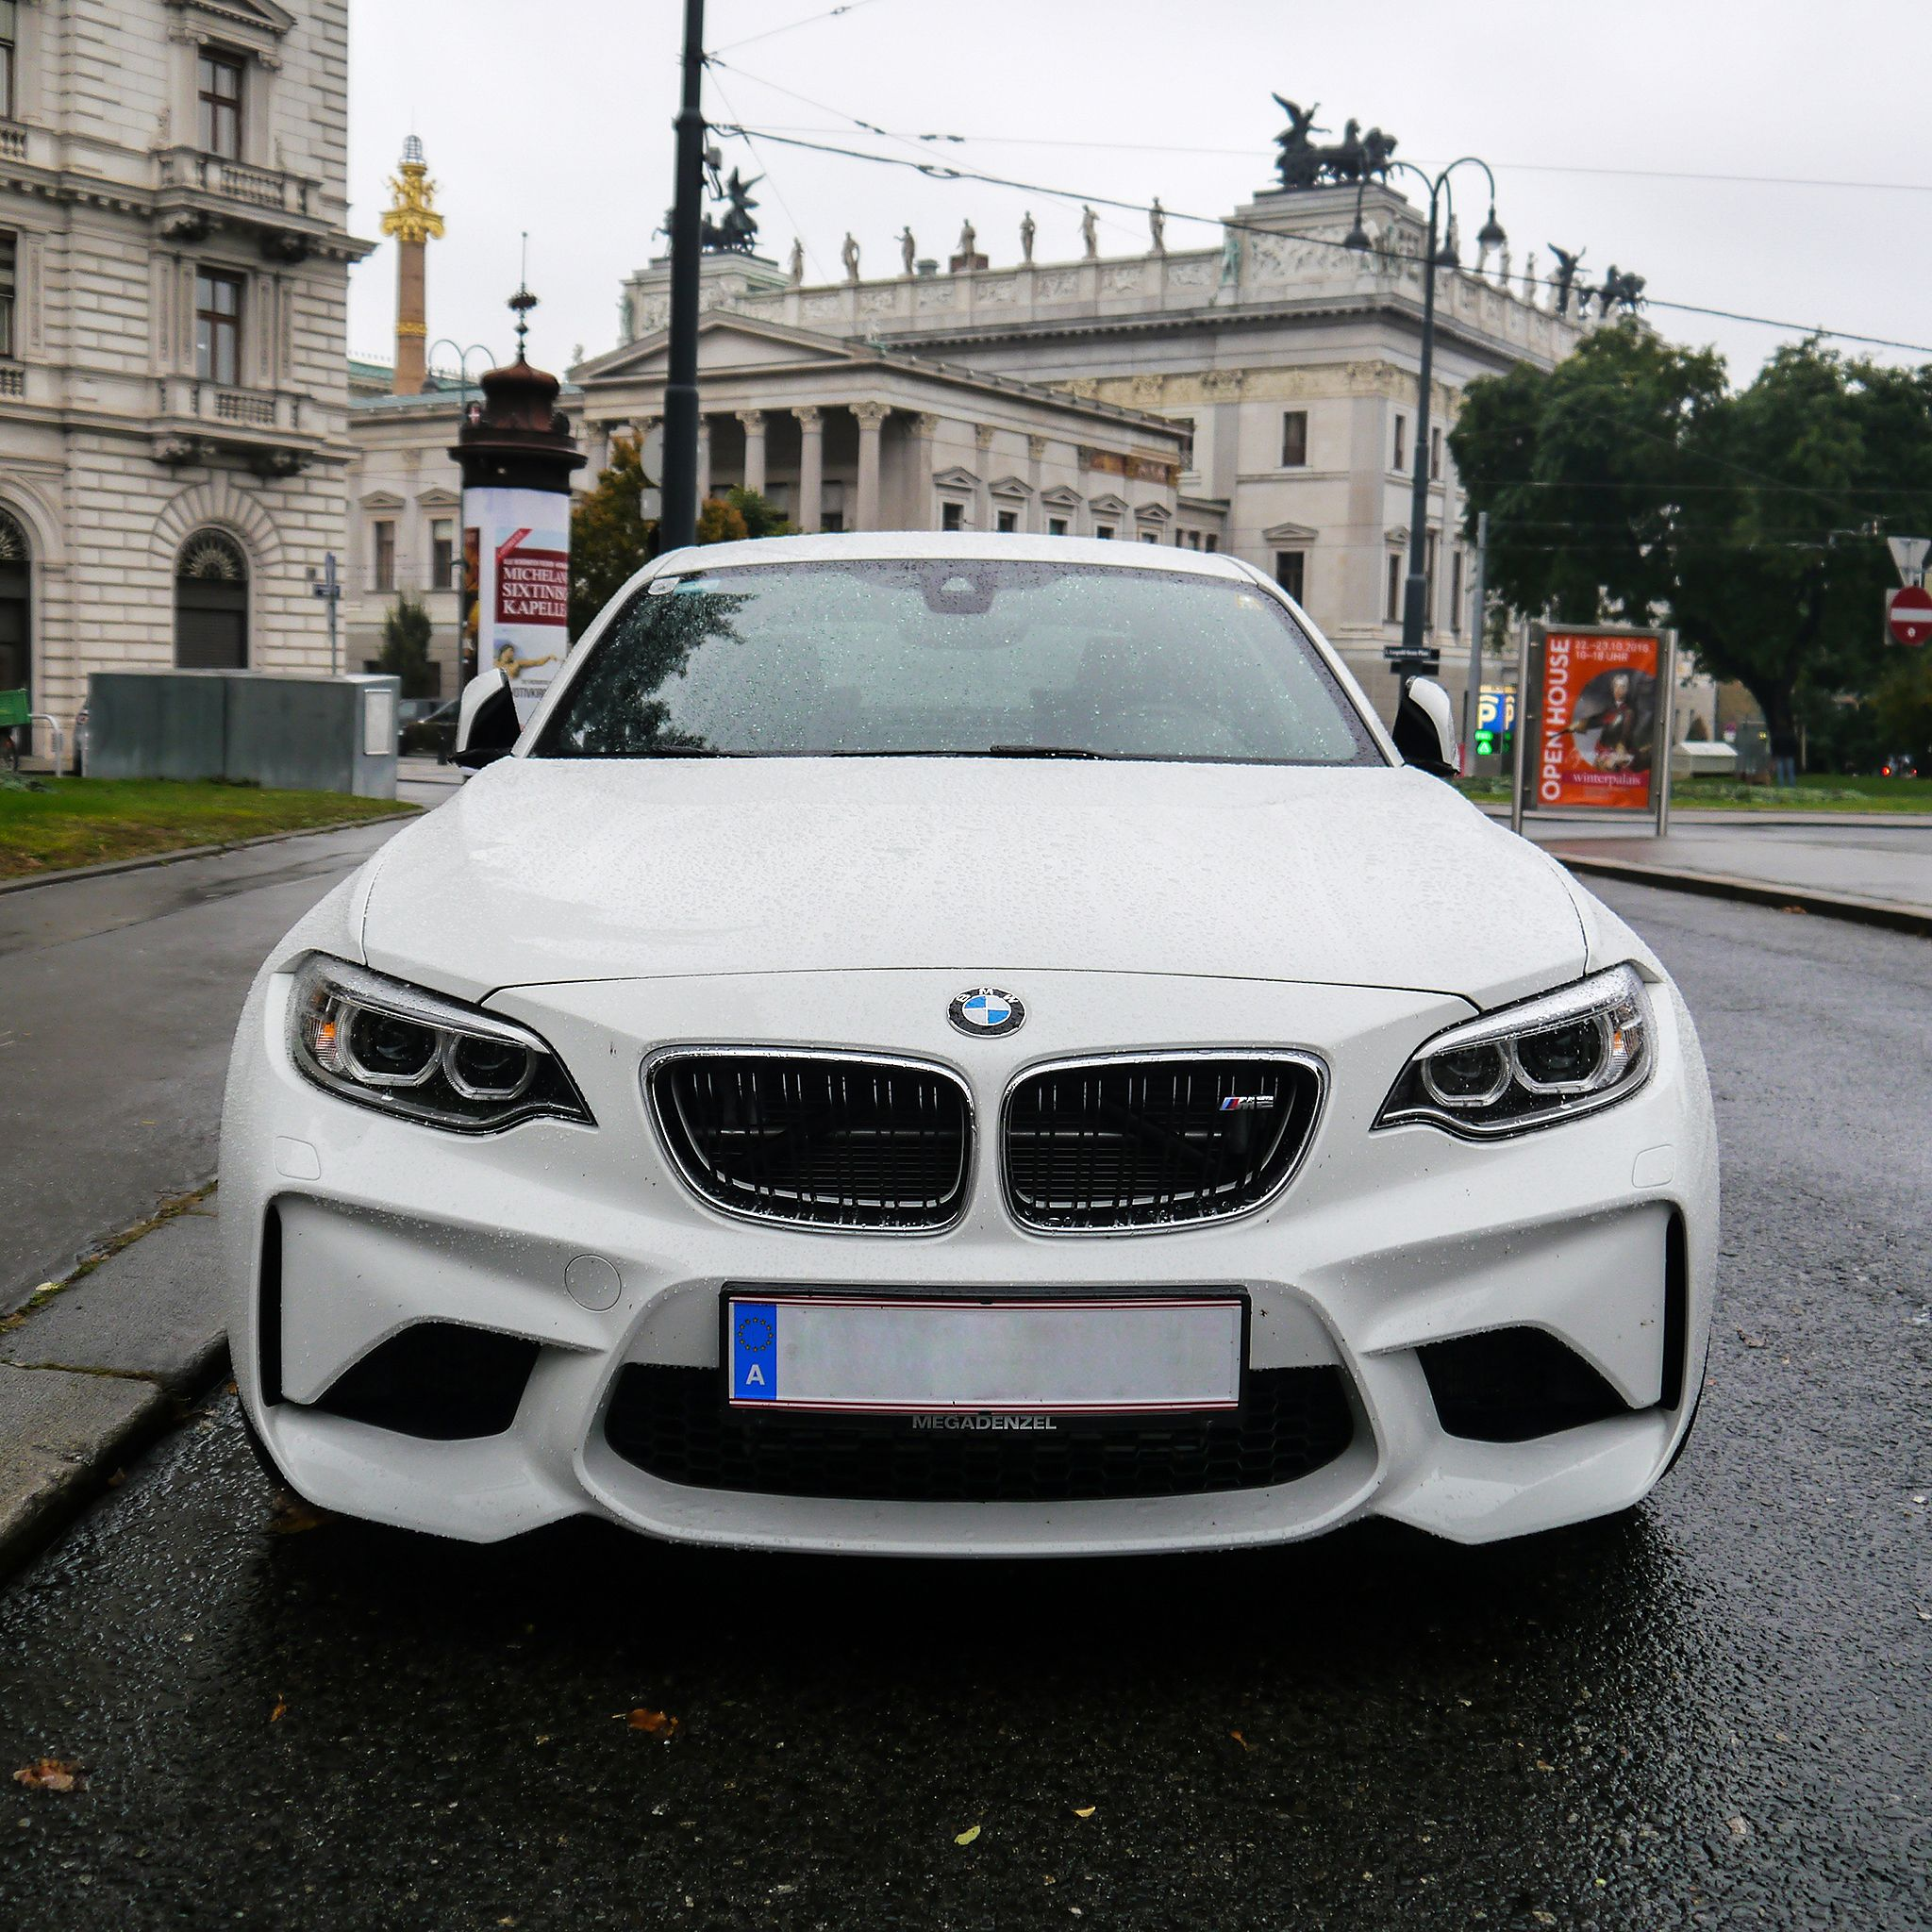 2016 Bmw M3: BMW M3 (2015)